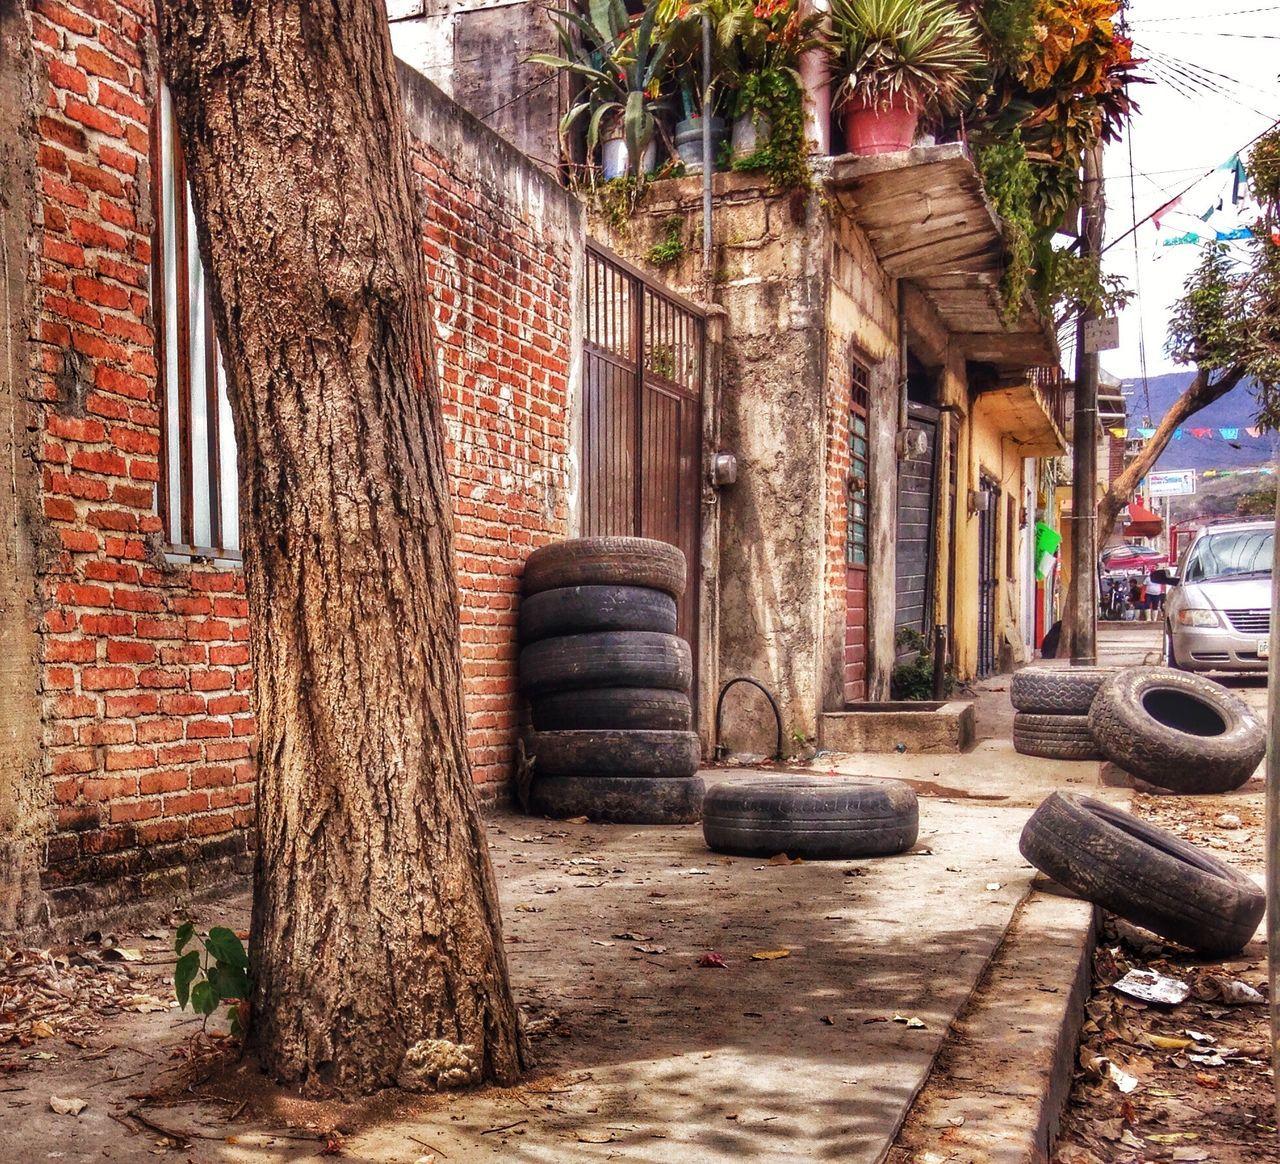 Talachas por la Patria Streetphotography IPhoneography Urban@ndante The Street Photographer - 2015 EyeEm Awards